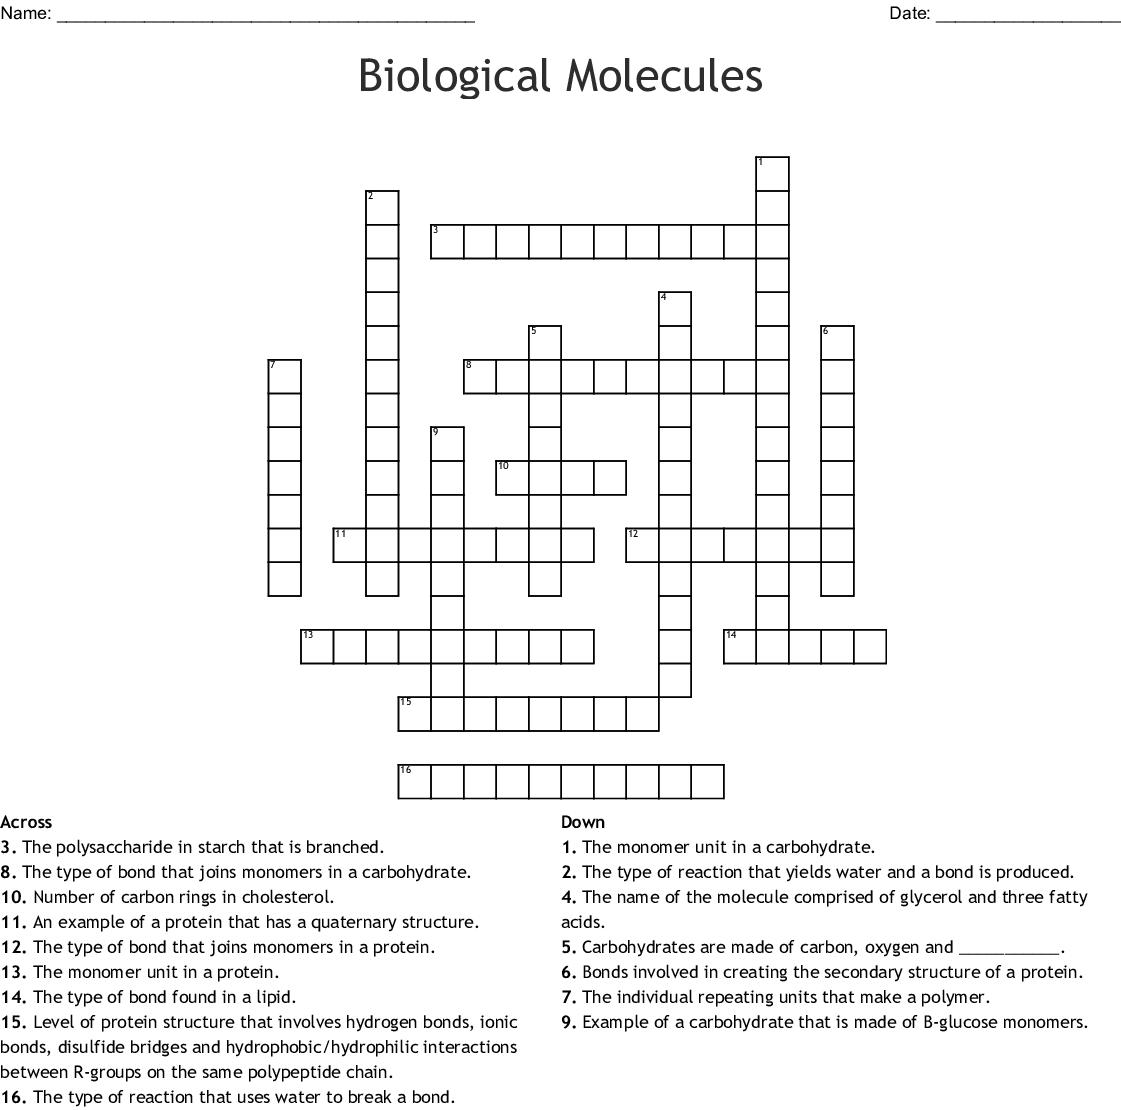 Biological Molecules Crossword